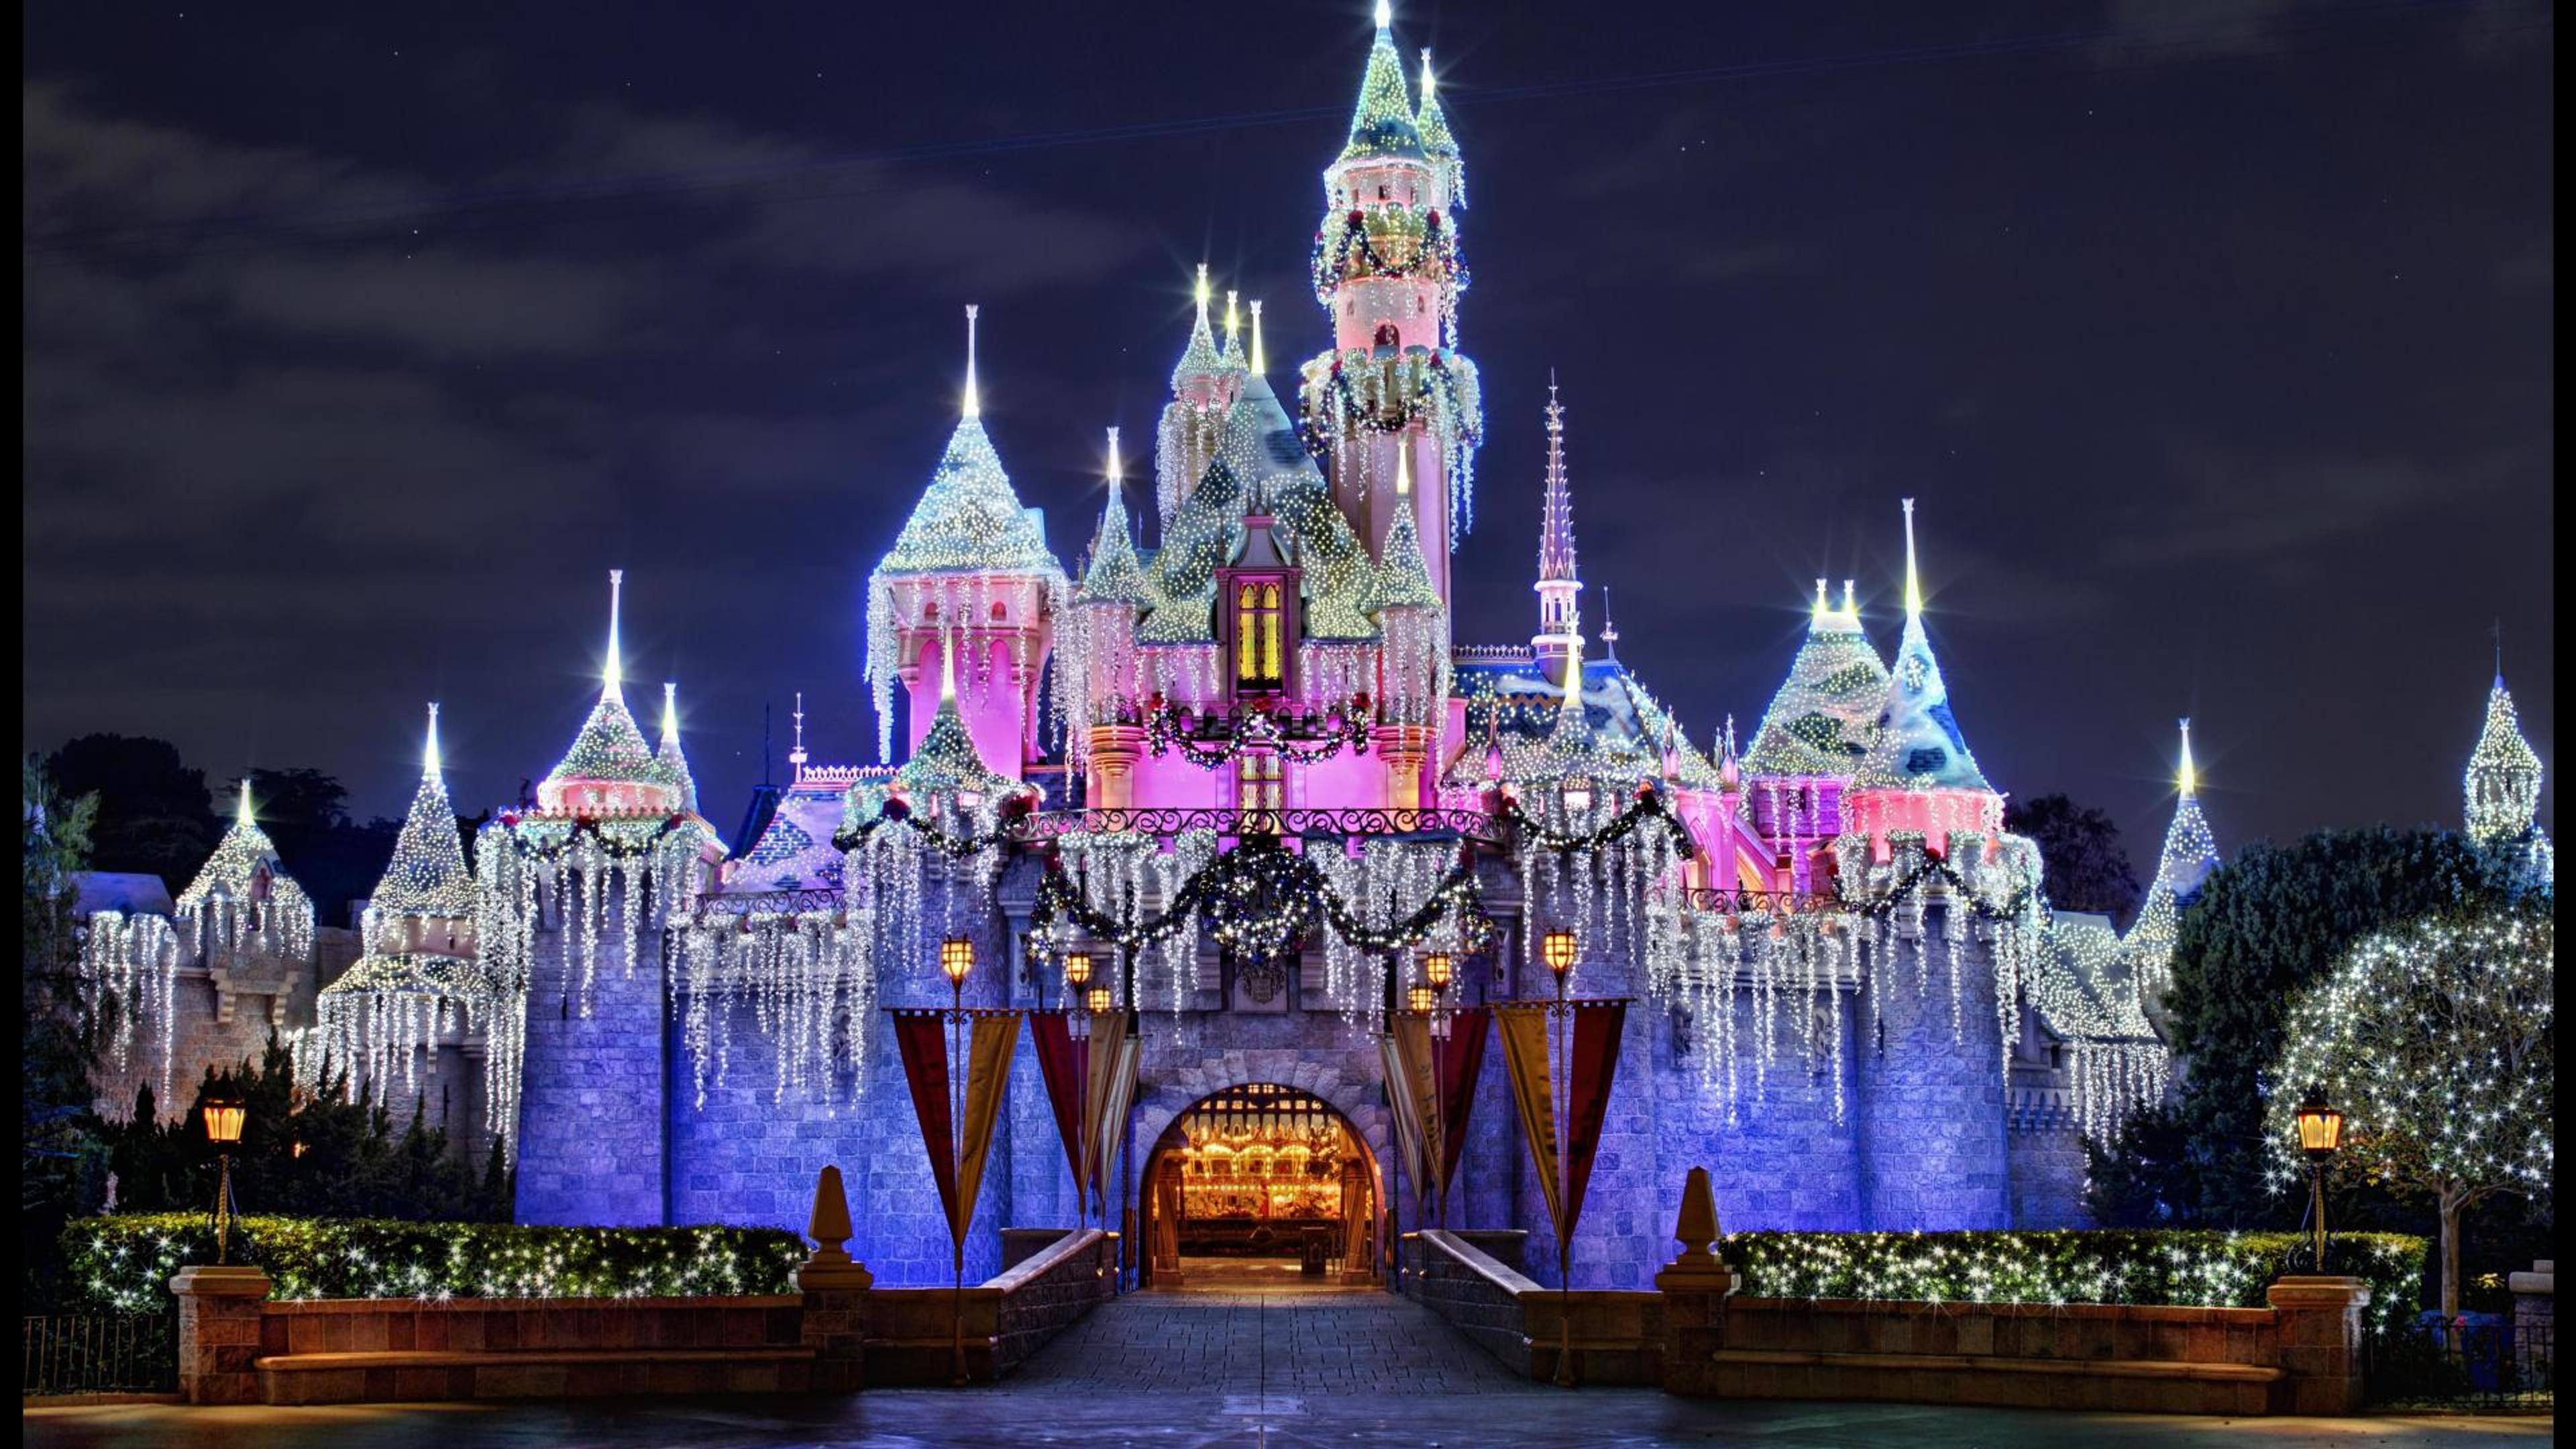 Disneyland Paris In Winter Spirit Hd Wallpaper